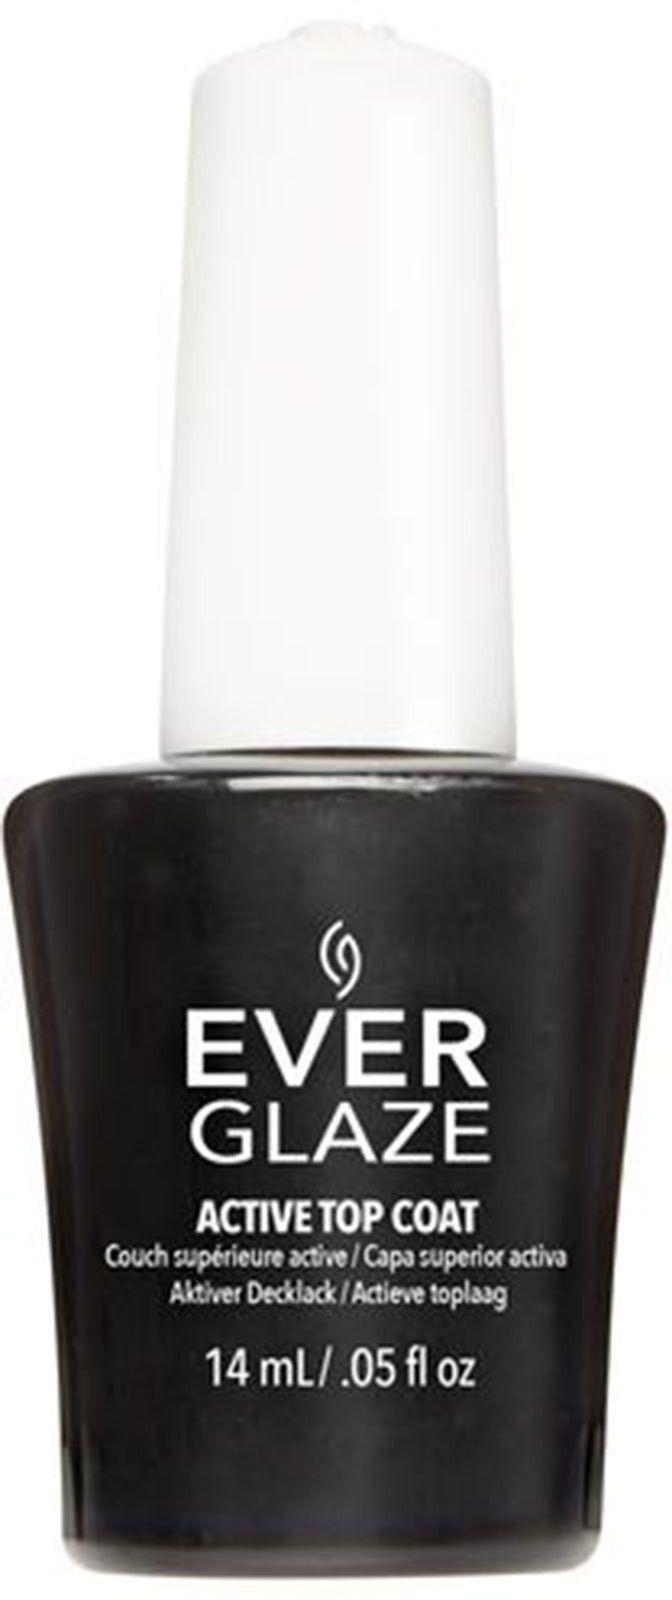 China Glaze Everglaze Nail Lacquer - Active Top Coat (0.5Oz) (82747 ...